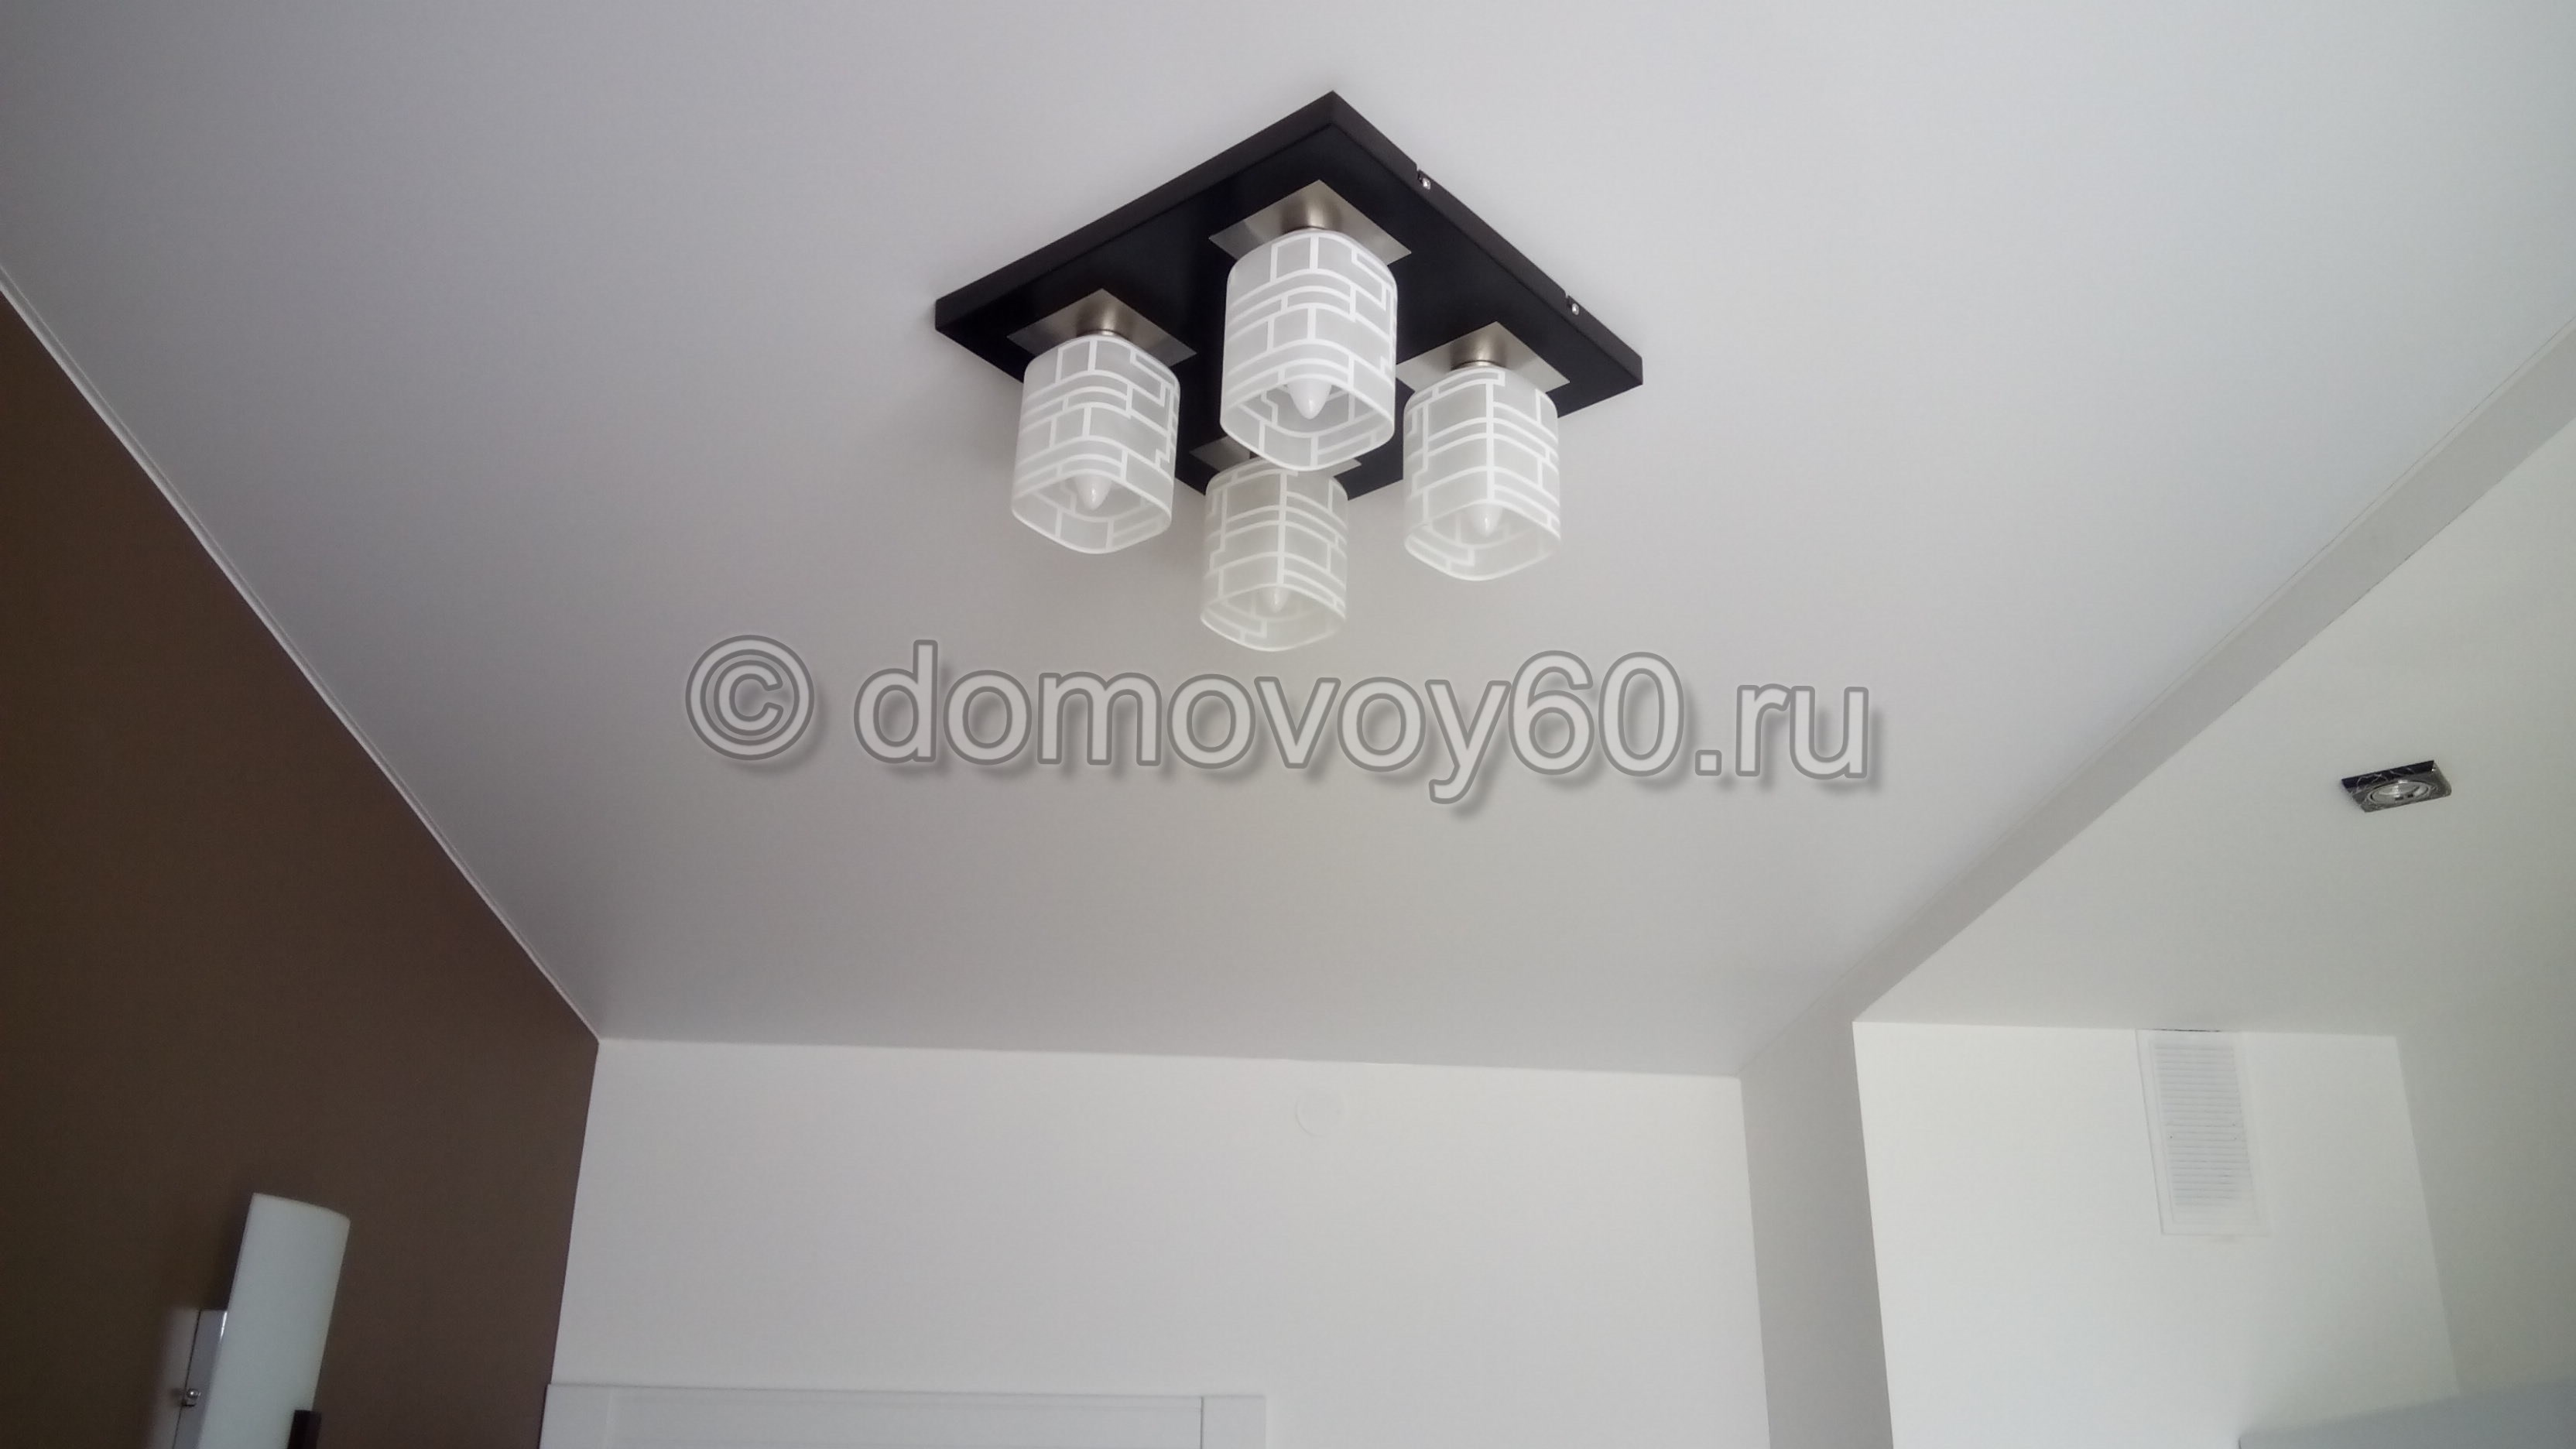 domovoy60-086